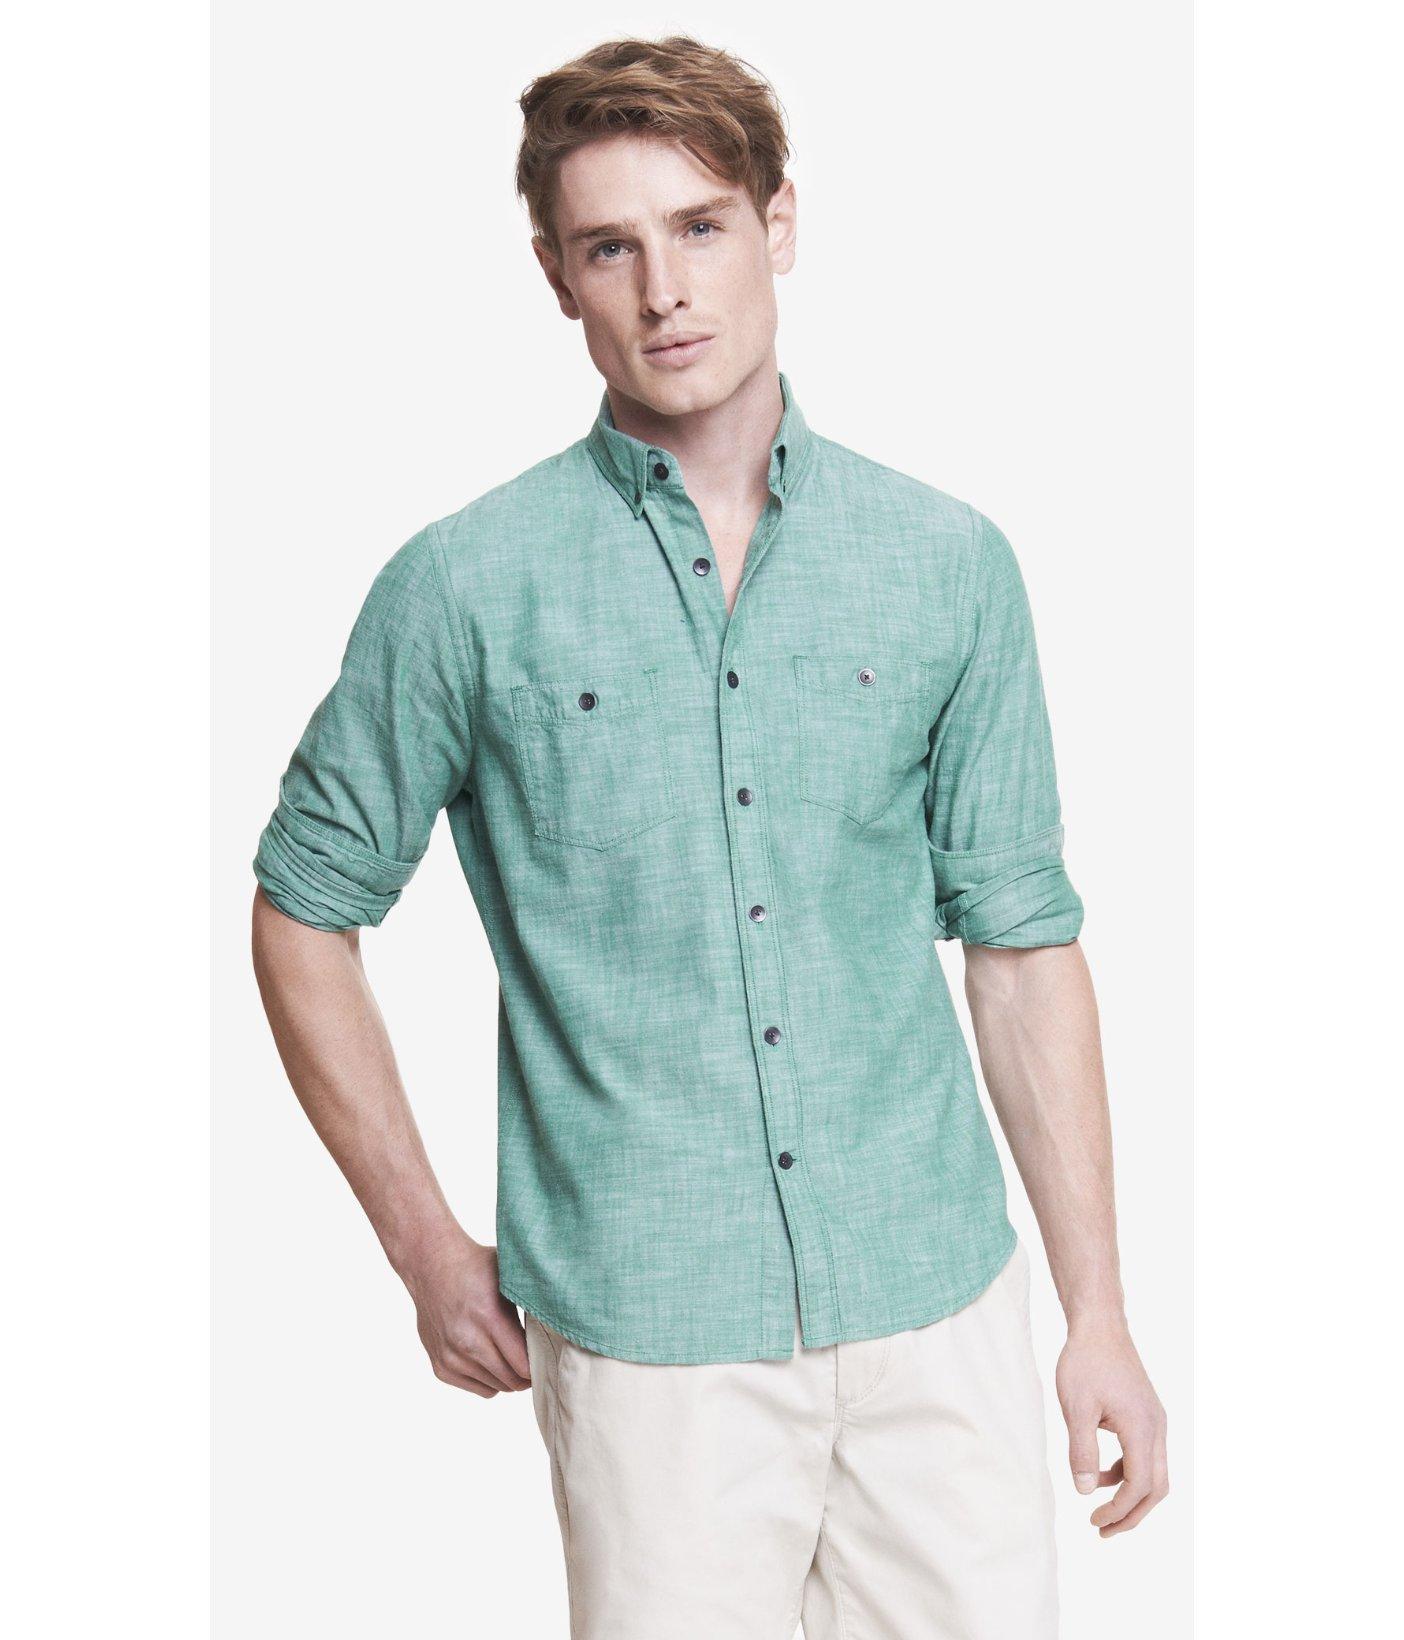 Express Slub Chambray Button Down Collar Shirt In Green